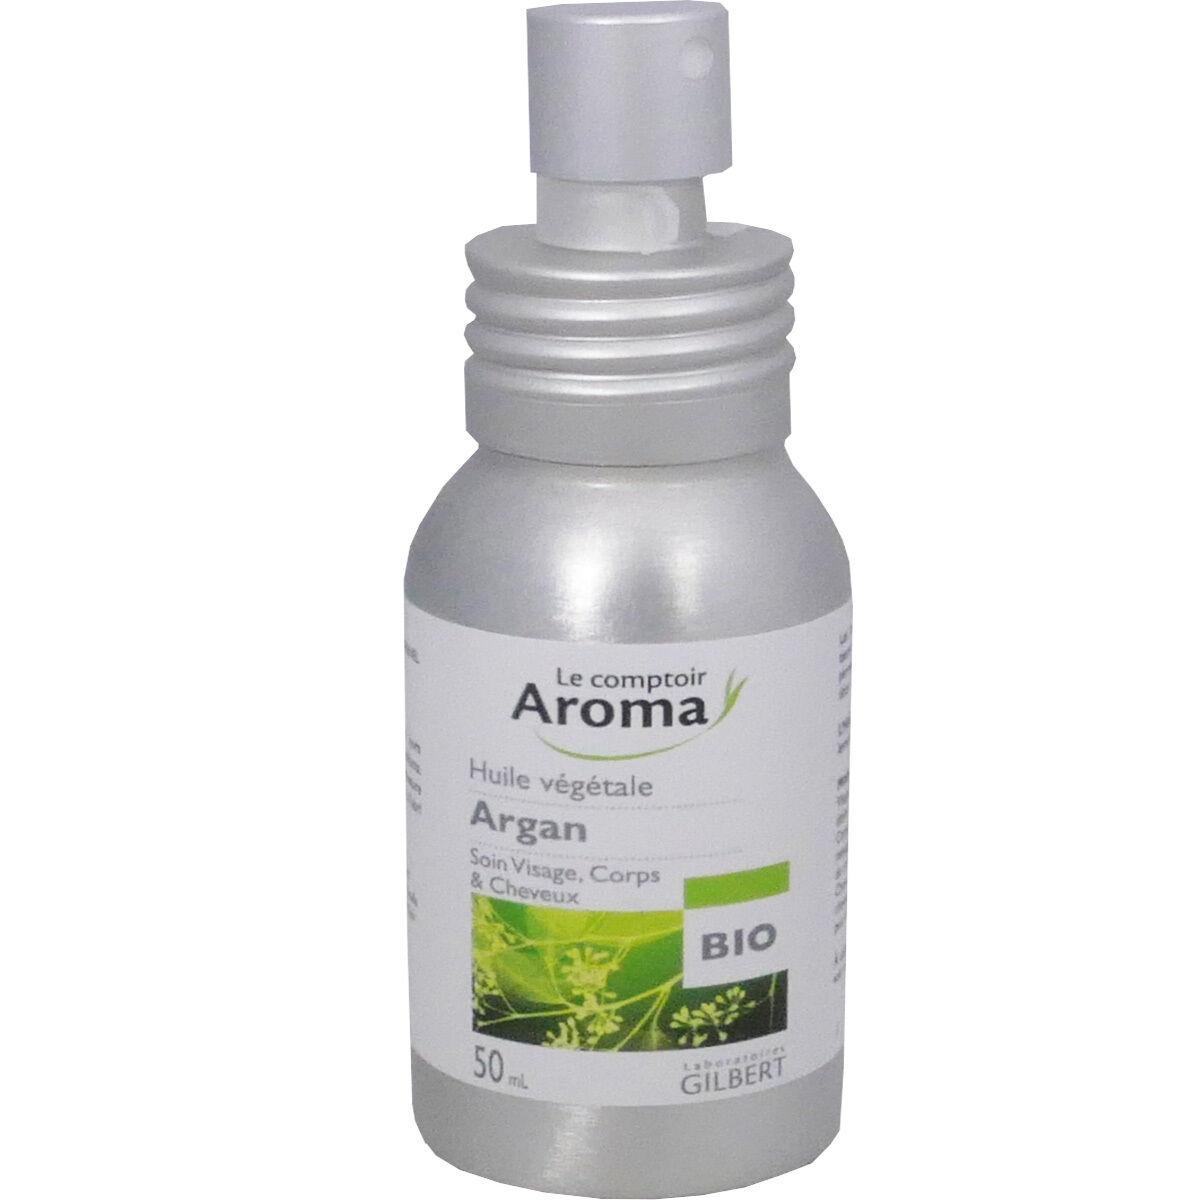 Le comptoir aroma huile vegetale argan 50 ml